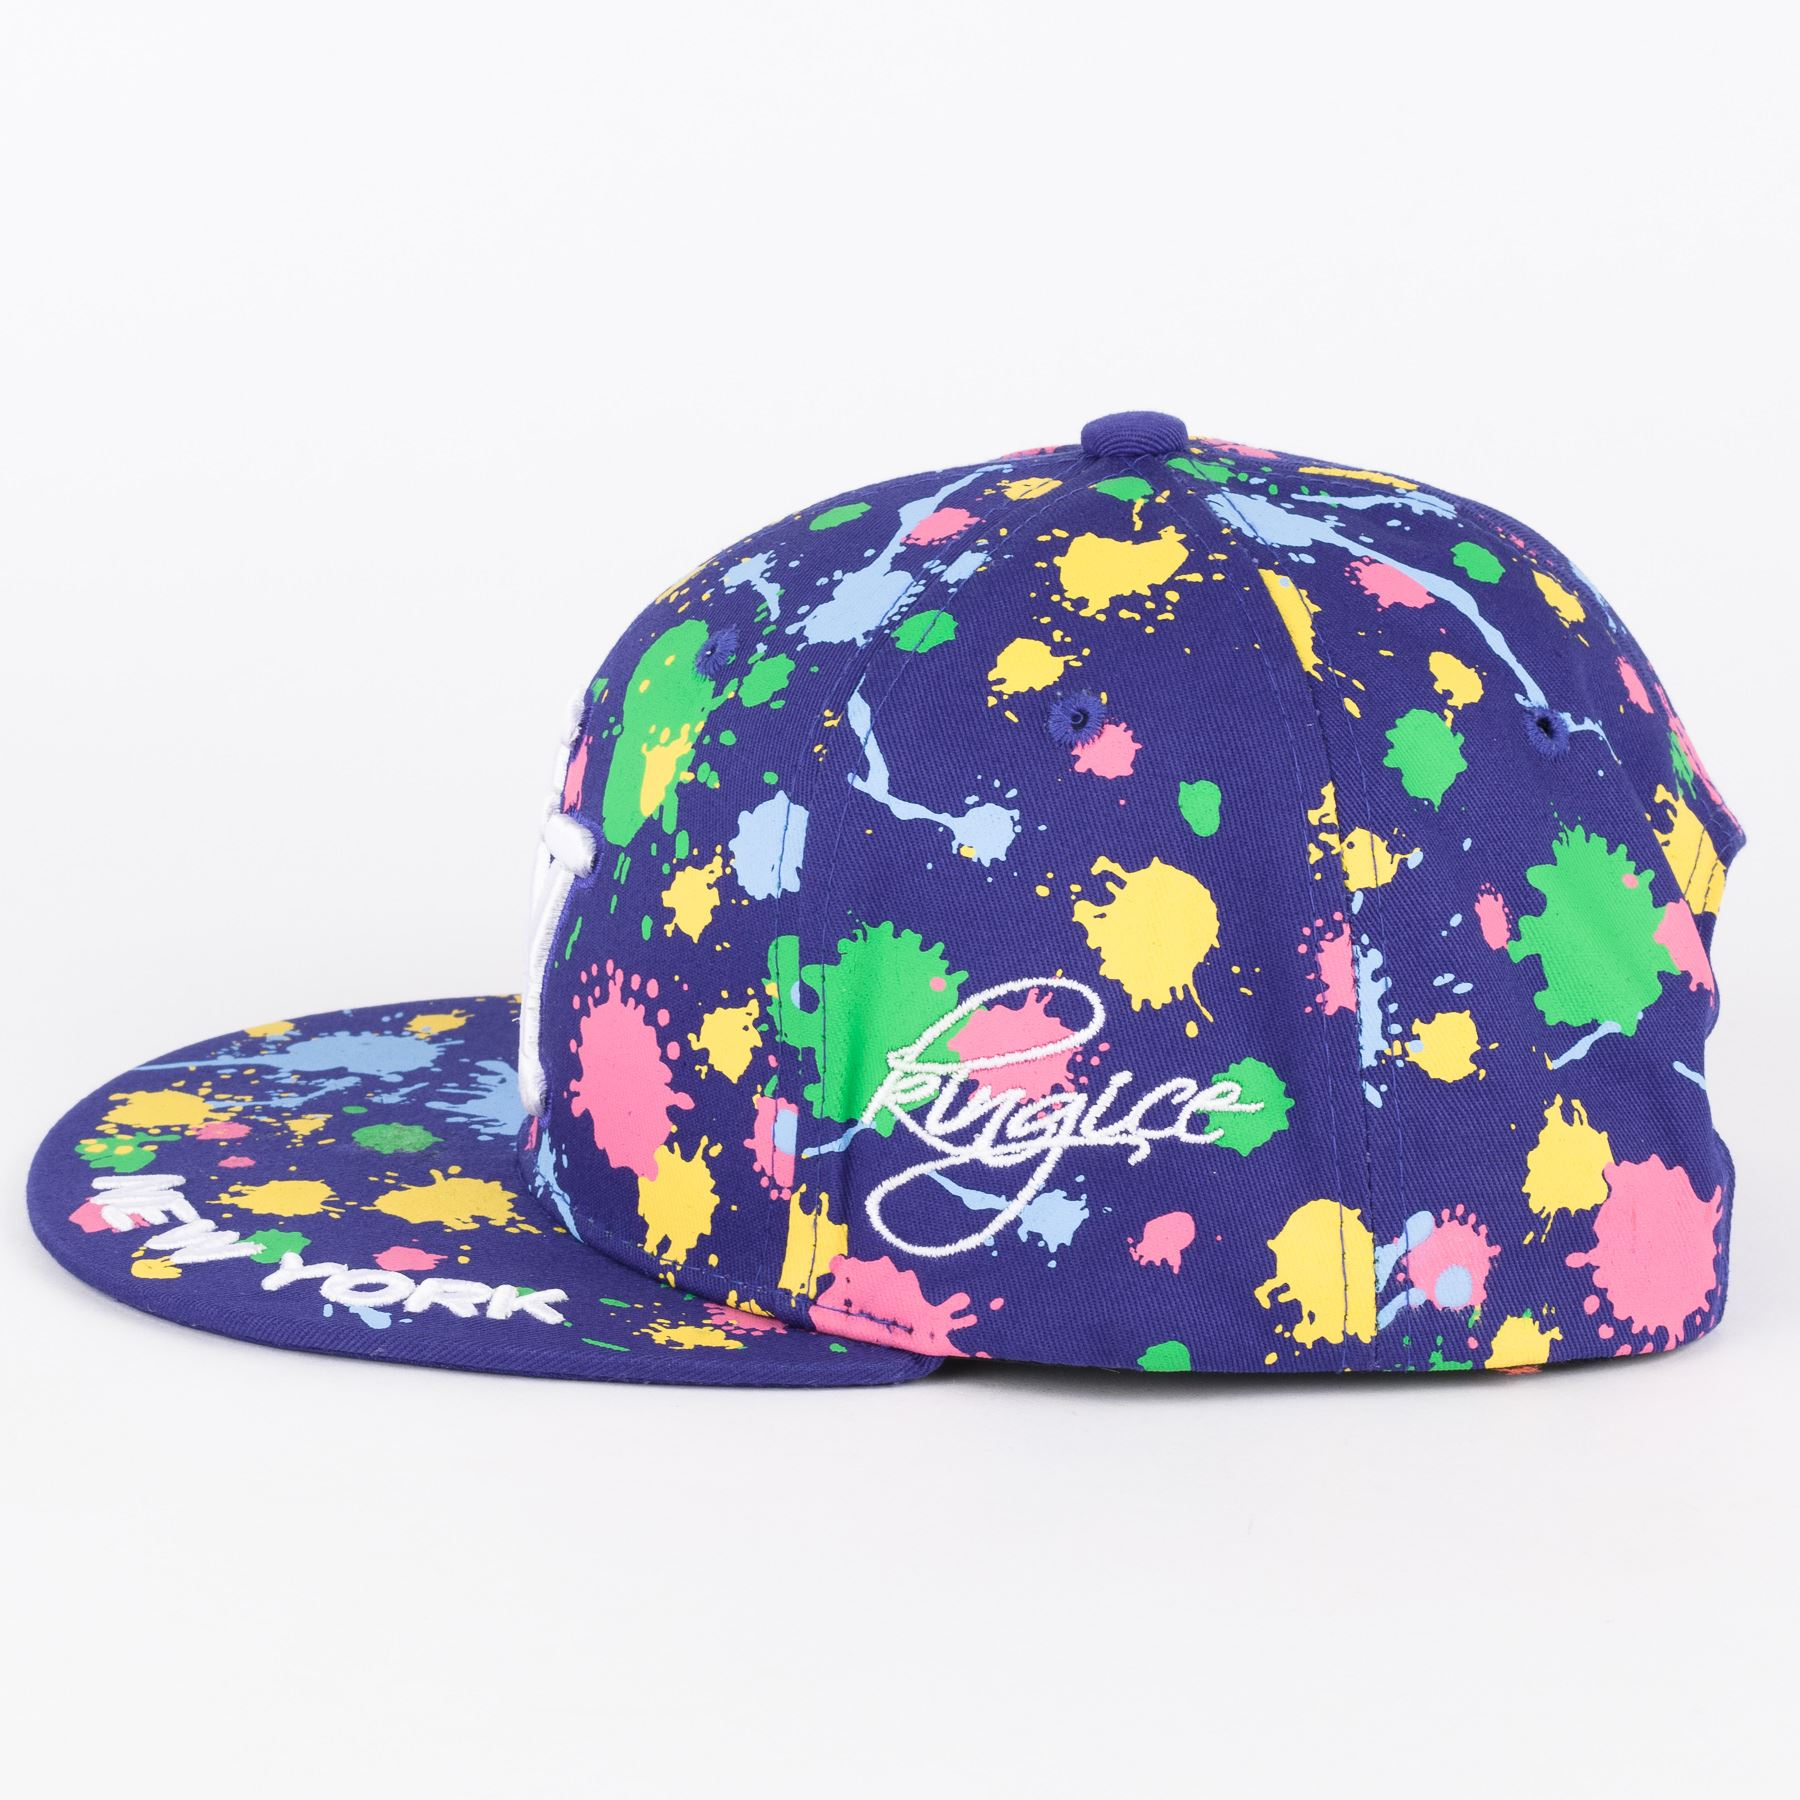 NY on Paint Splash Snapback Embroidered Hip hop Hat